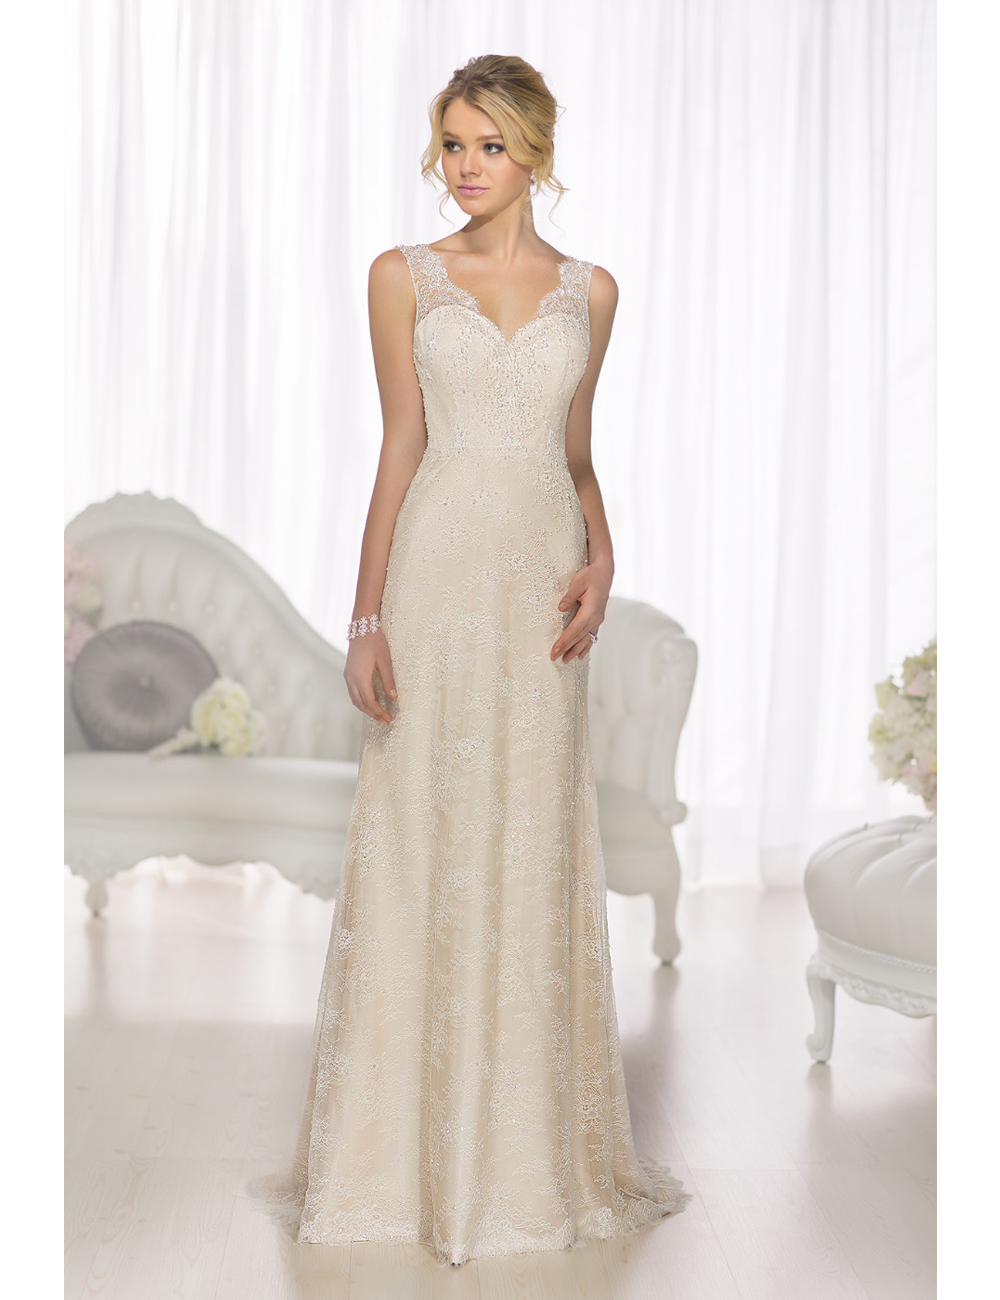 Nice Simple Wedding Dress Patterns Images - Wedding Dress Ideas ...